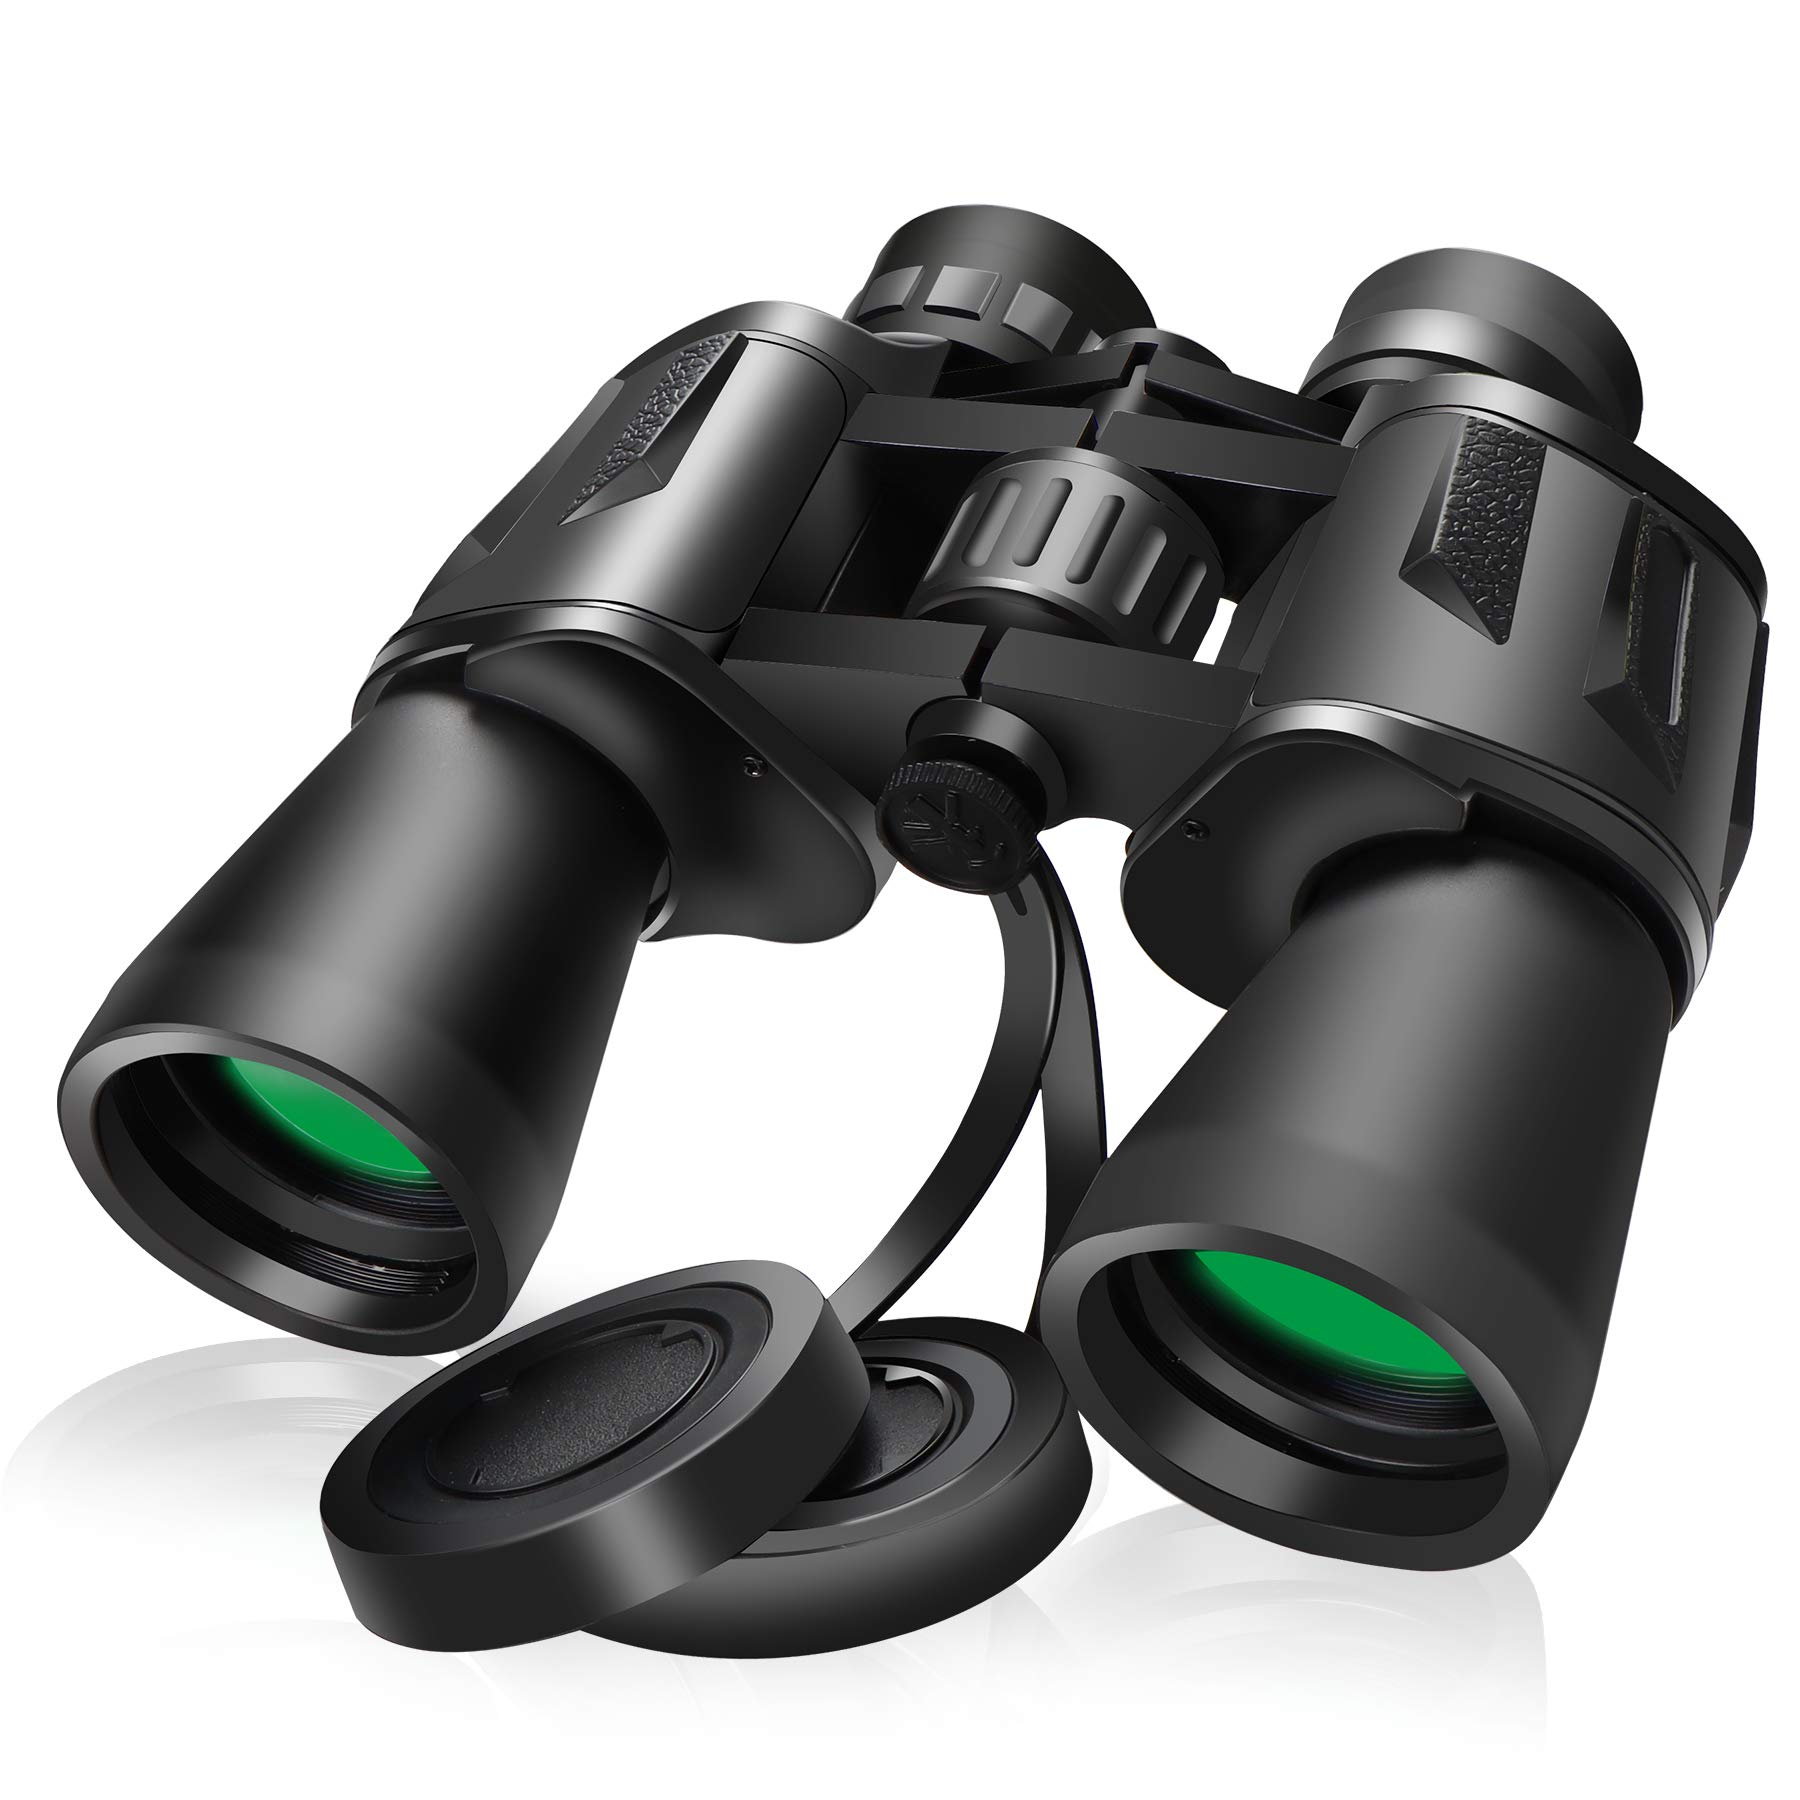 AMZSHURUI 10x50 Binoculars, Binoculars for Adults, Large Eyepiece, Powerful Binoculars for Bird Watching Hunting Travel Outdoor Sports Games and Concerts